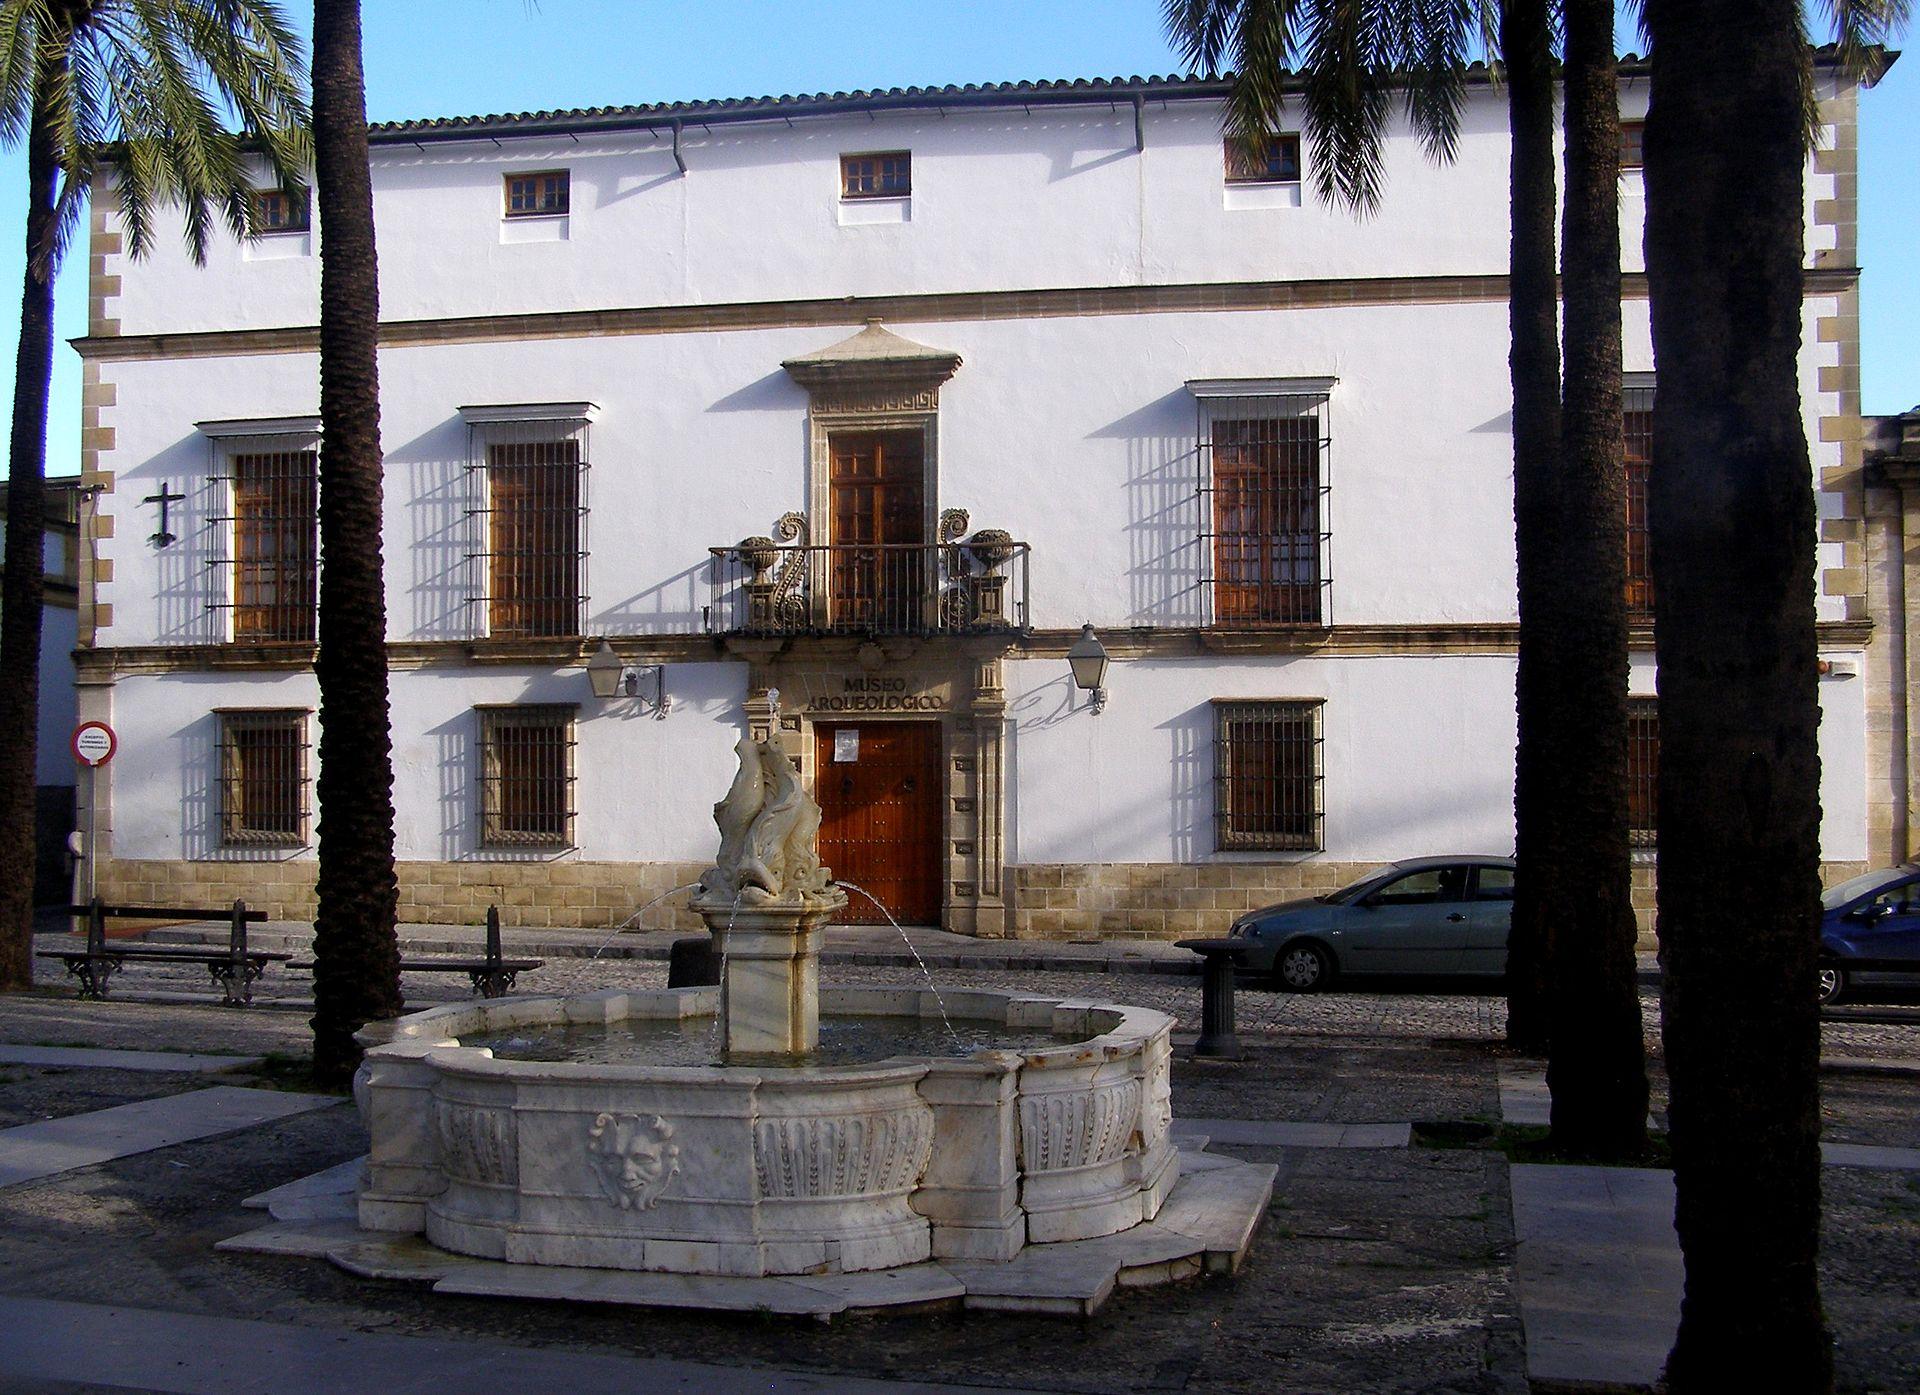 Museo arqueol gico municipal de jerez de la frontera for En jerez de la frontera